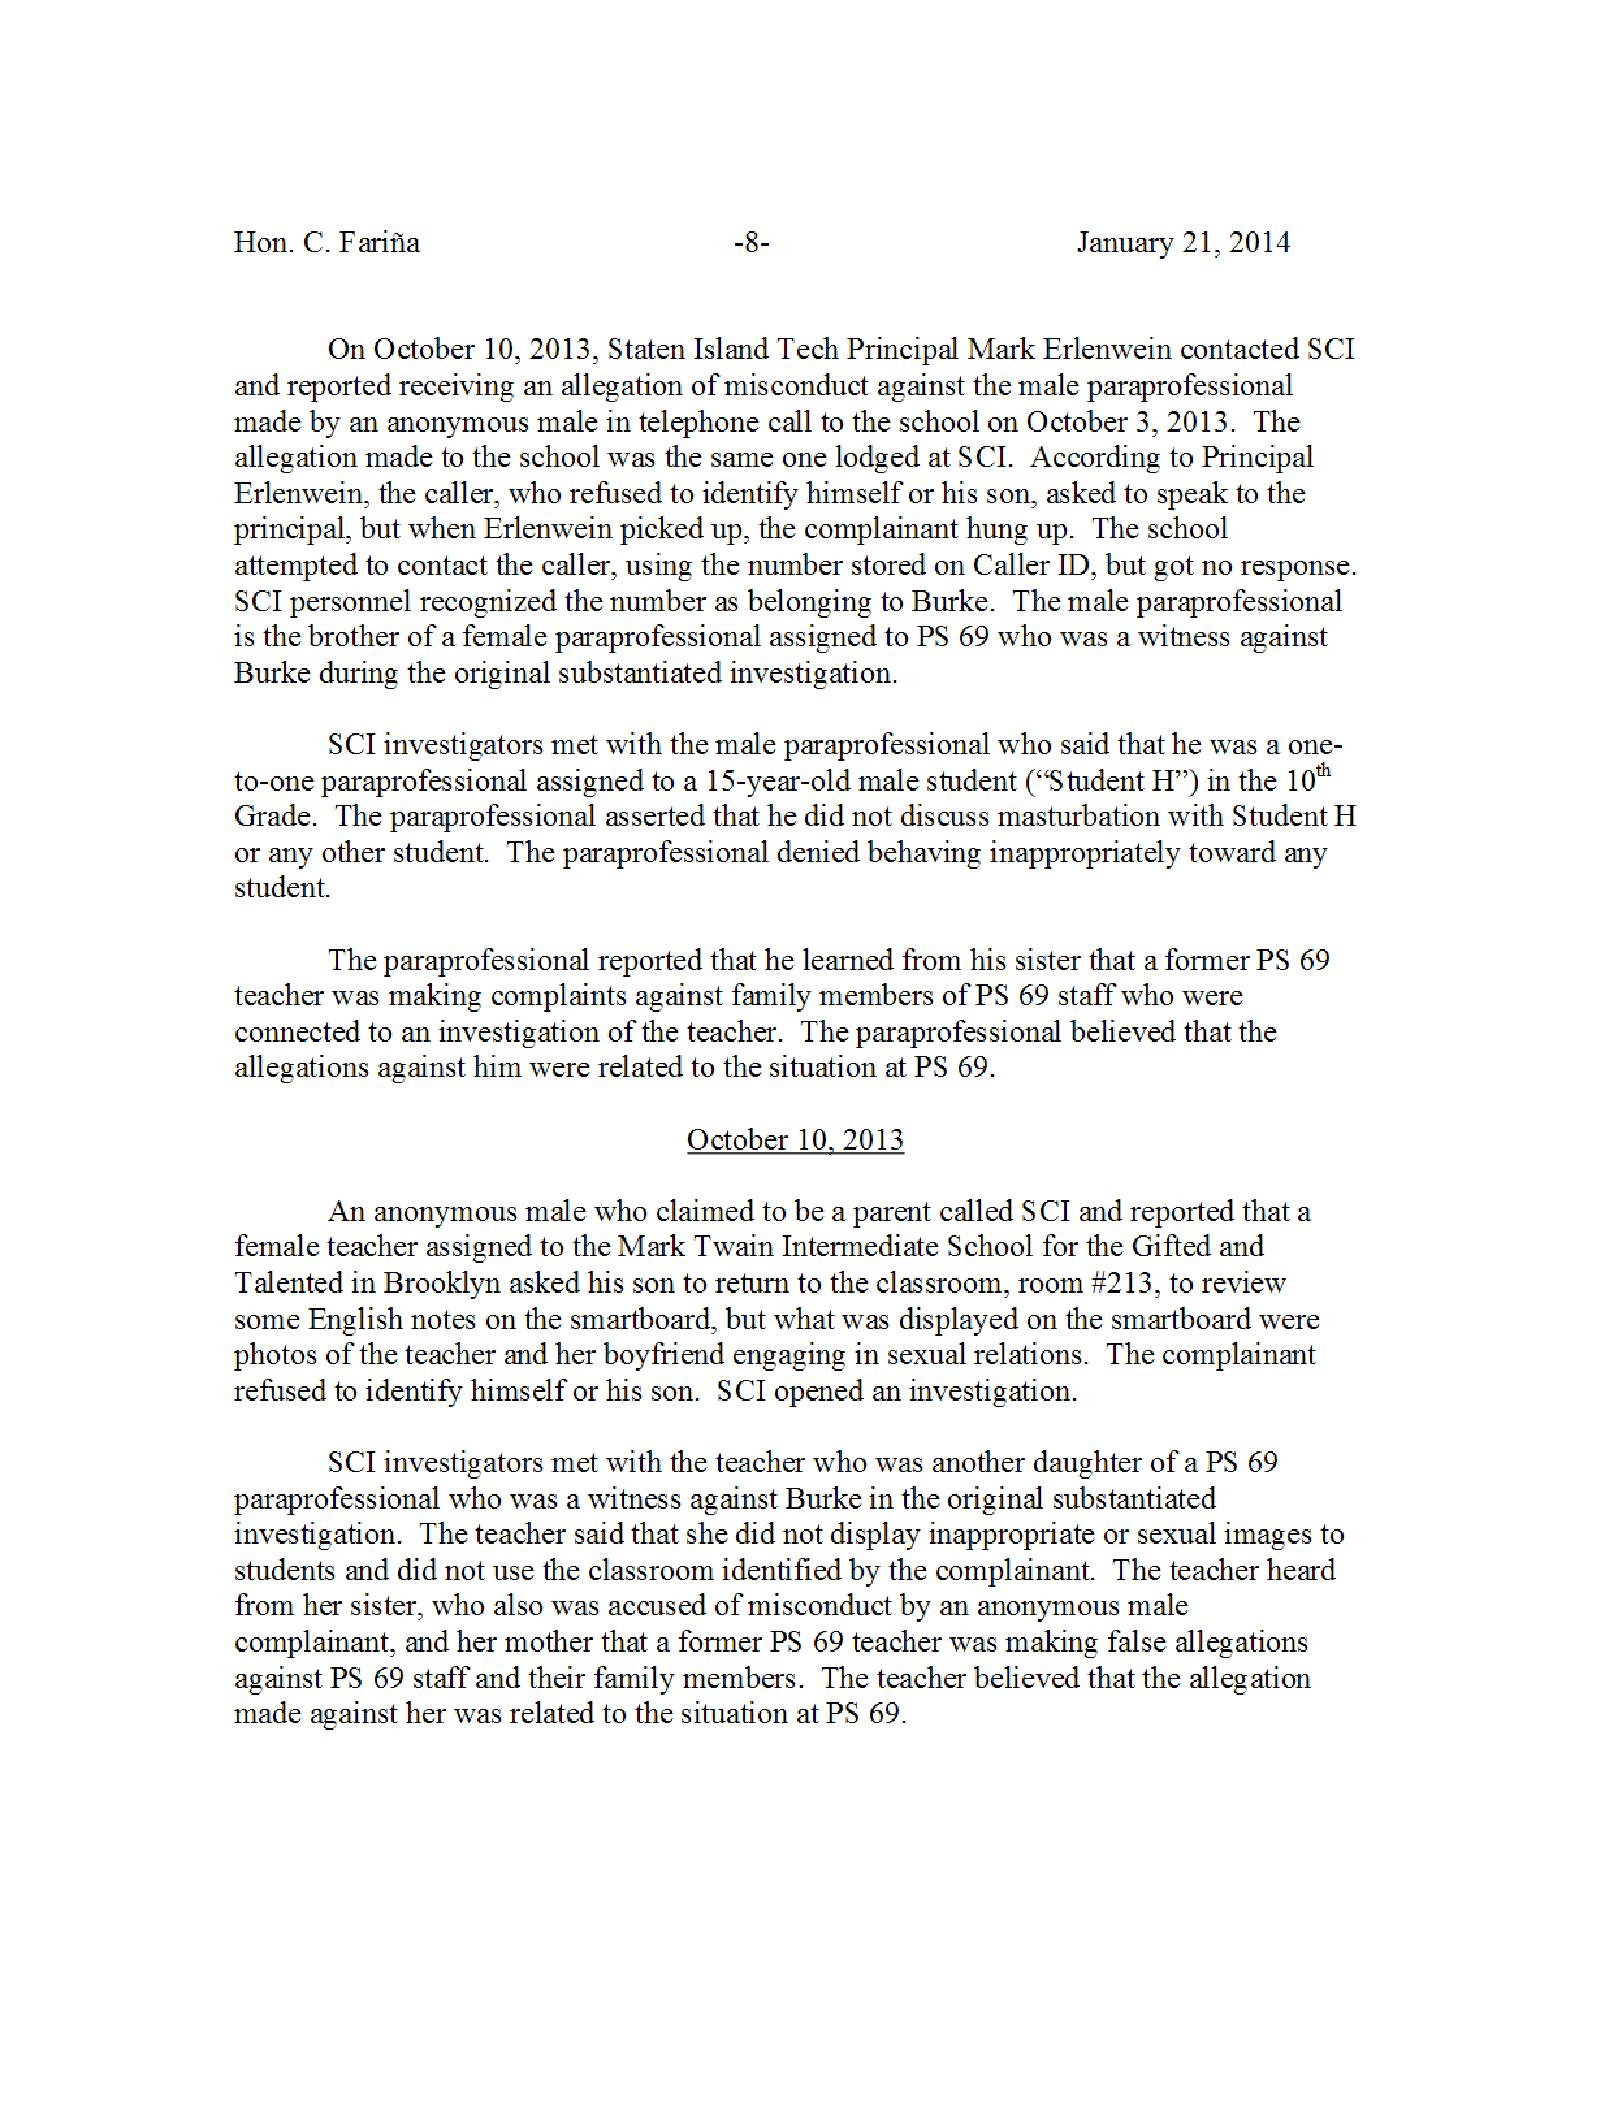 Copy of 1-22-2014 9-25-02 AM08.png